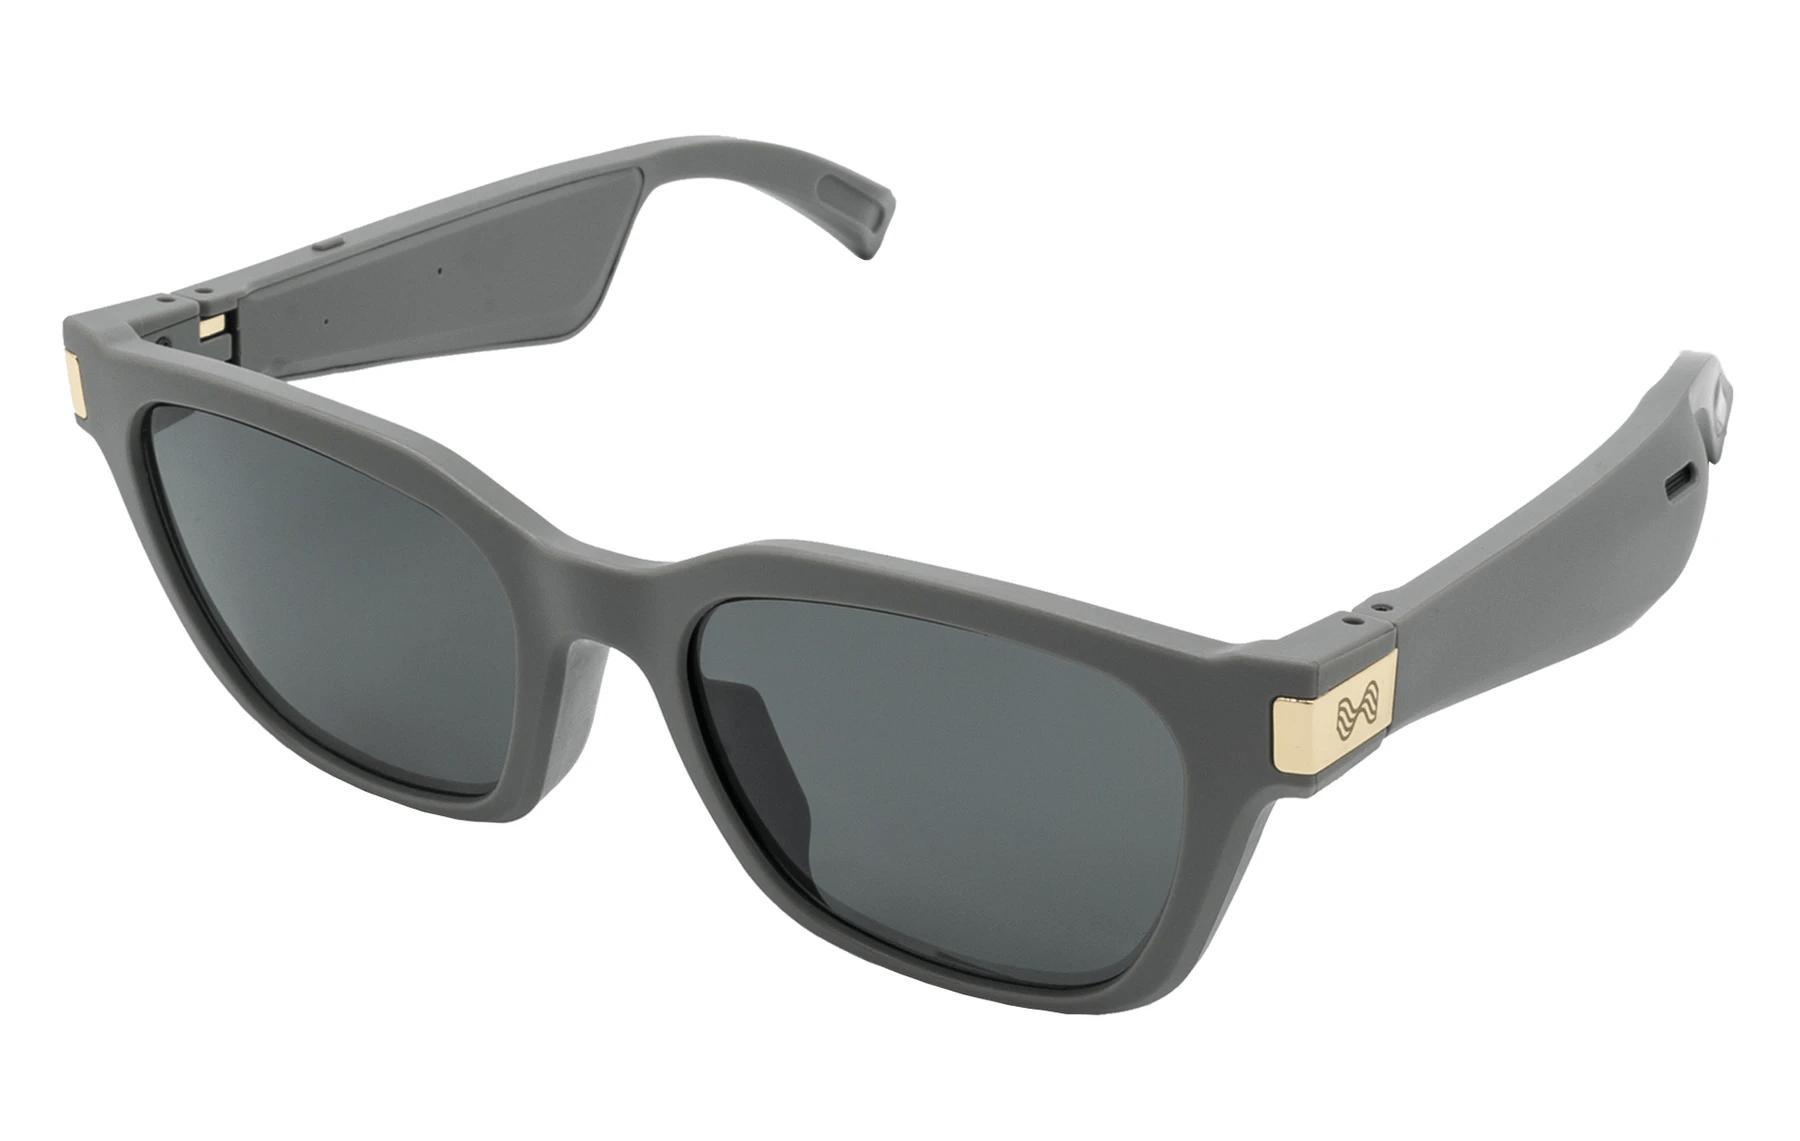 FLOWS Bruno's Bluetooth Audio Sunglasses Review